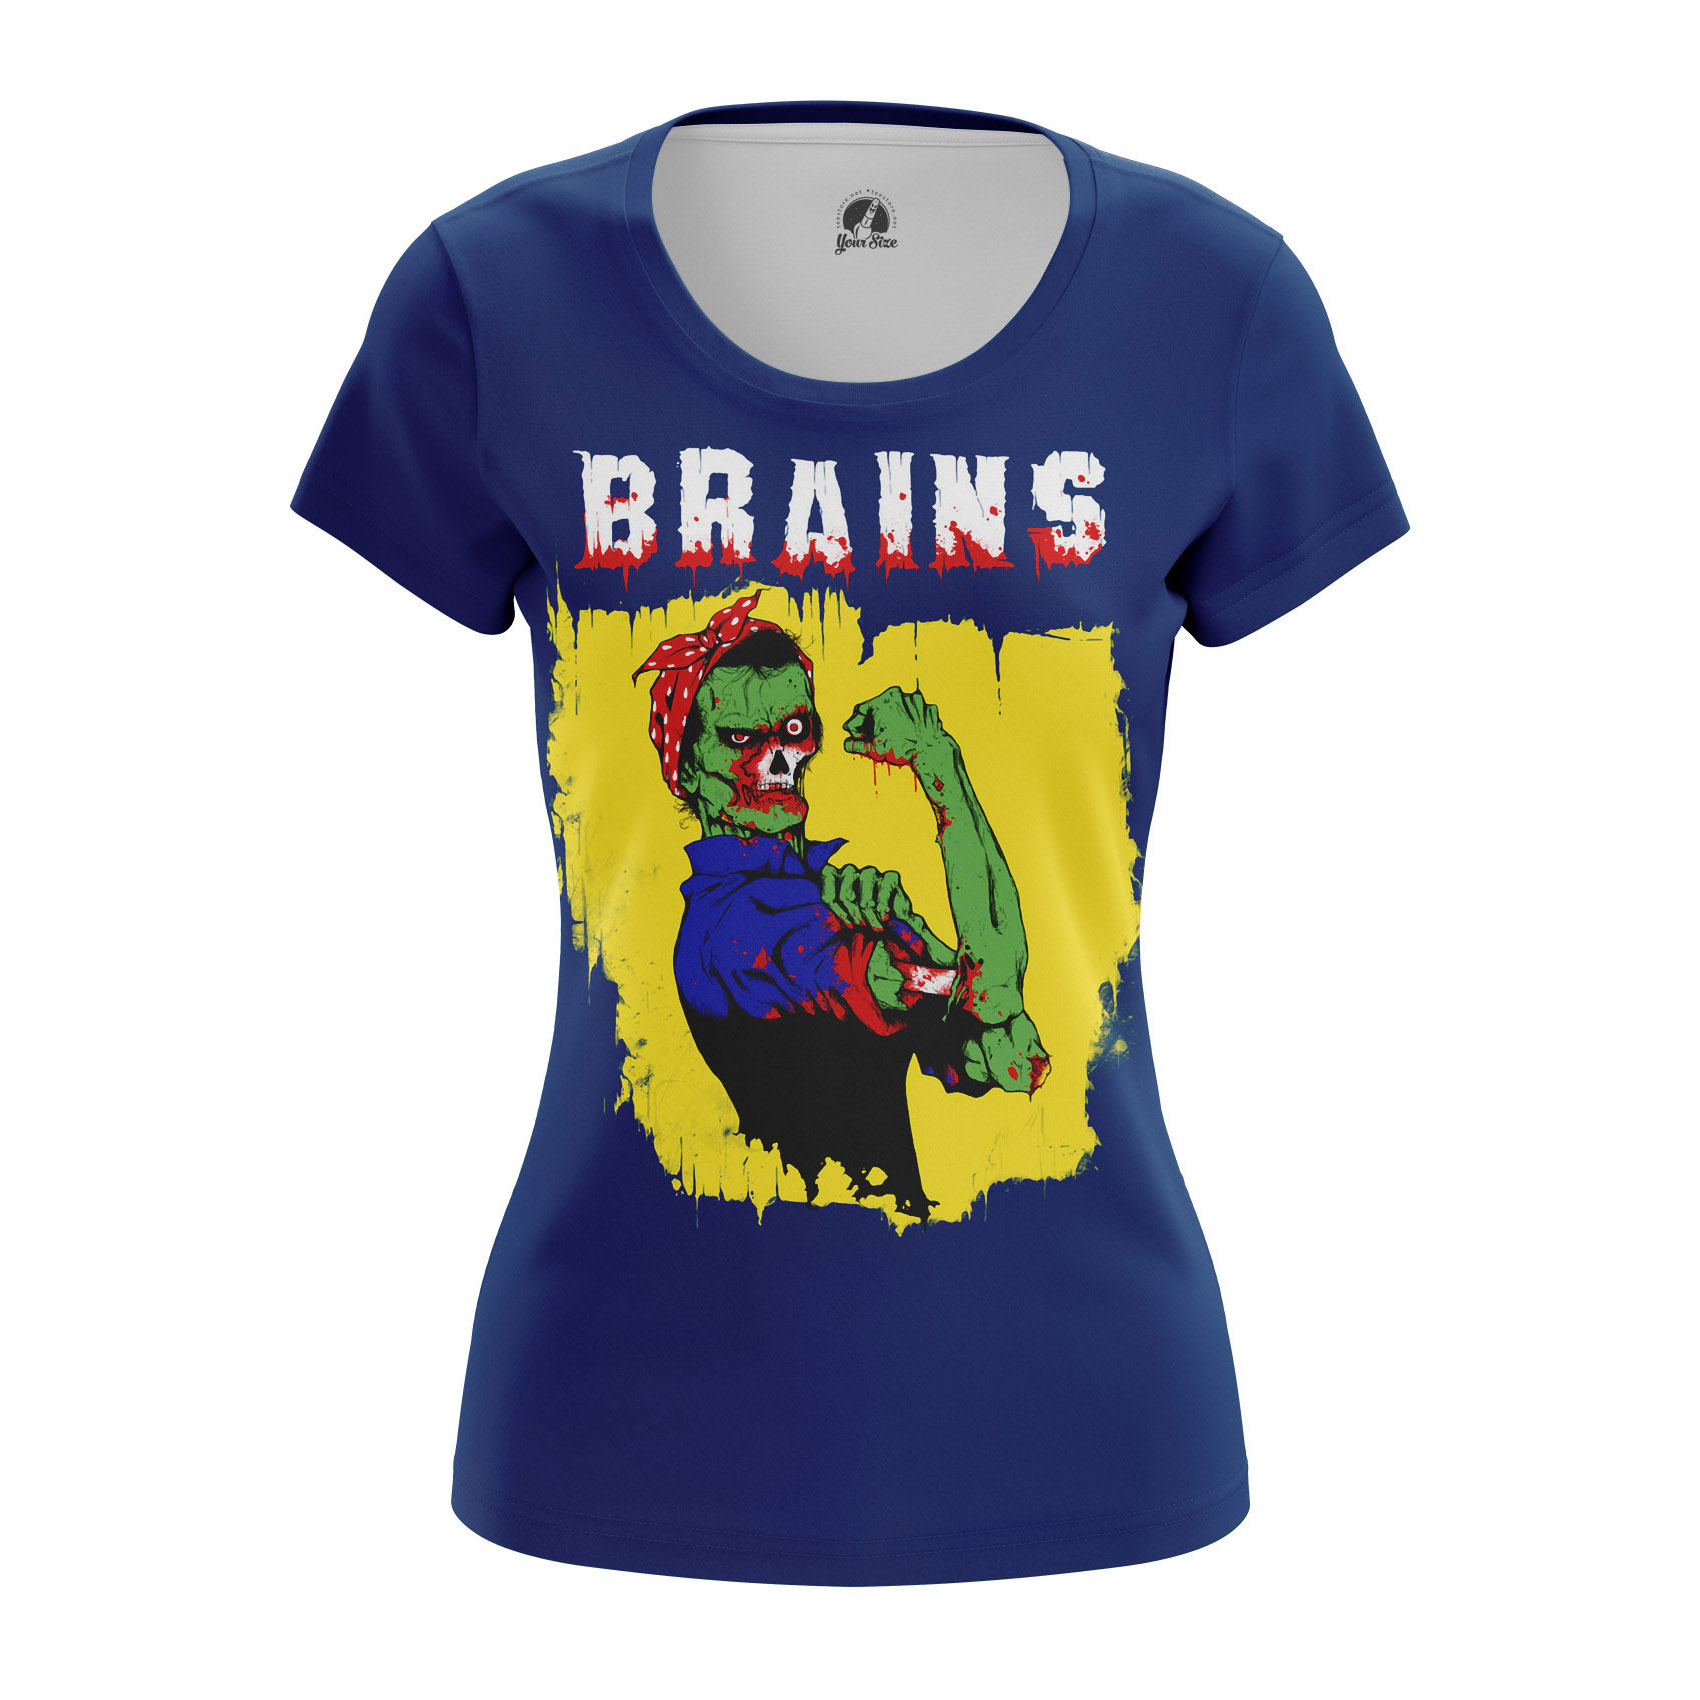 W-Tee-Brains_1482275265_101